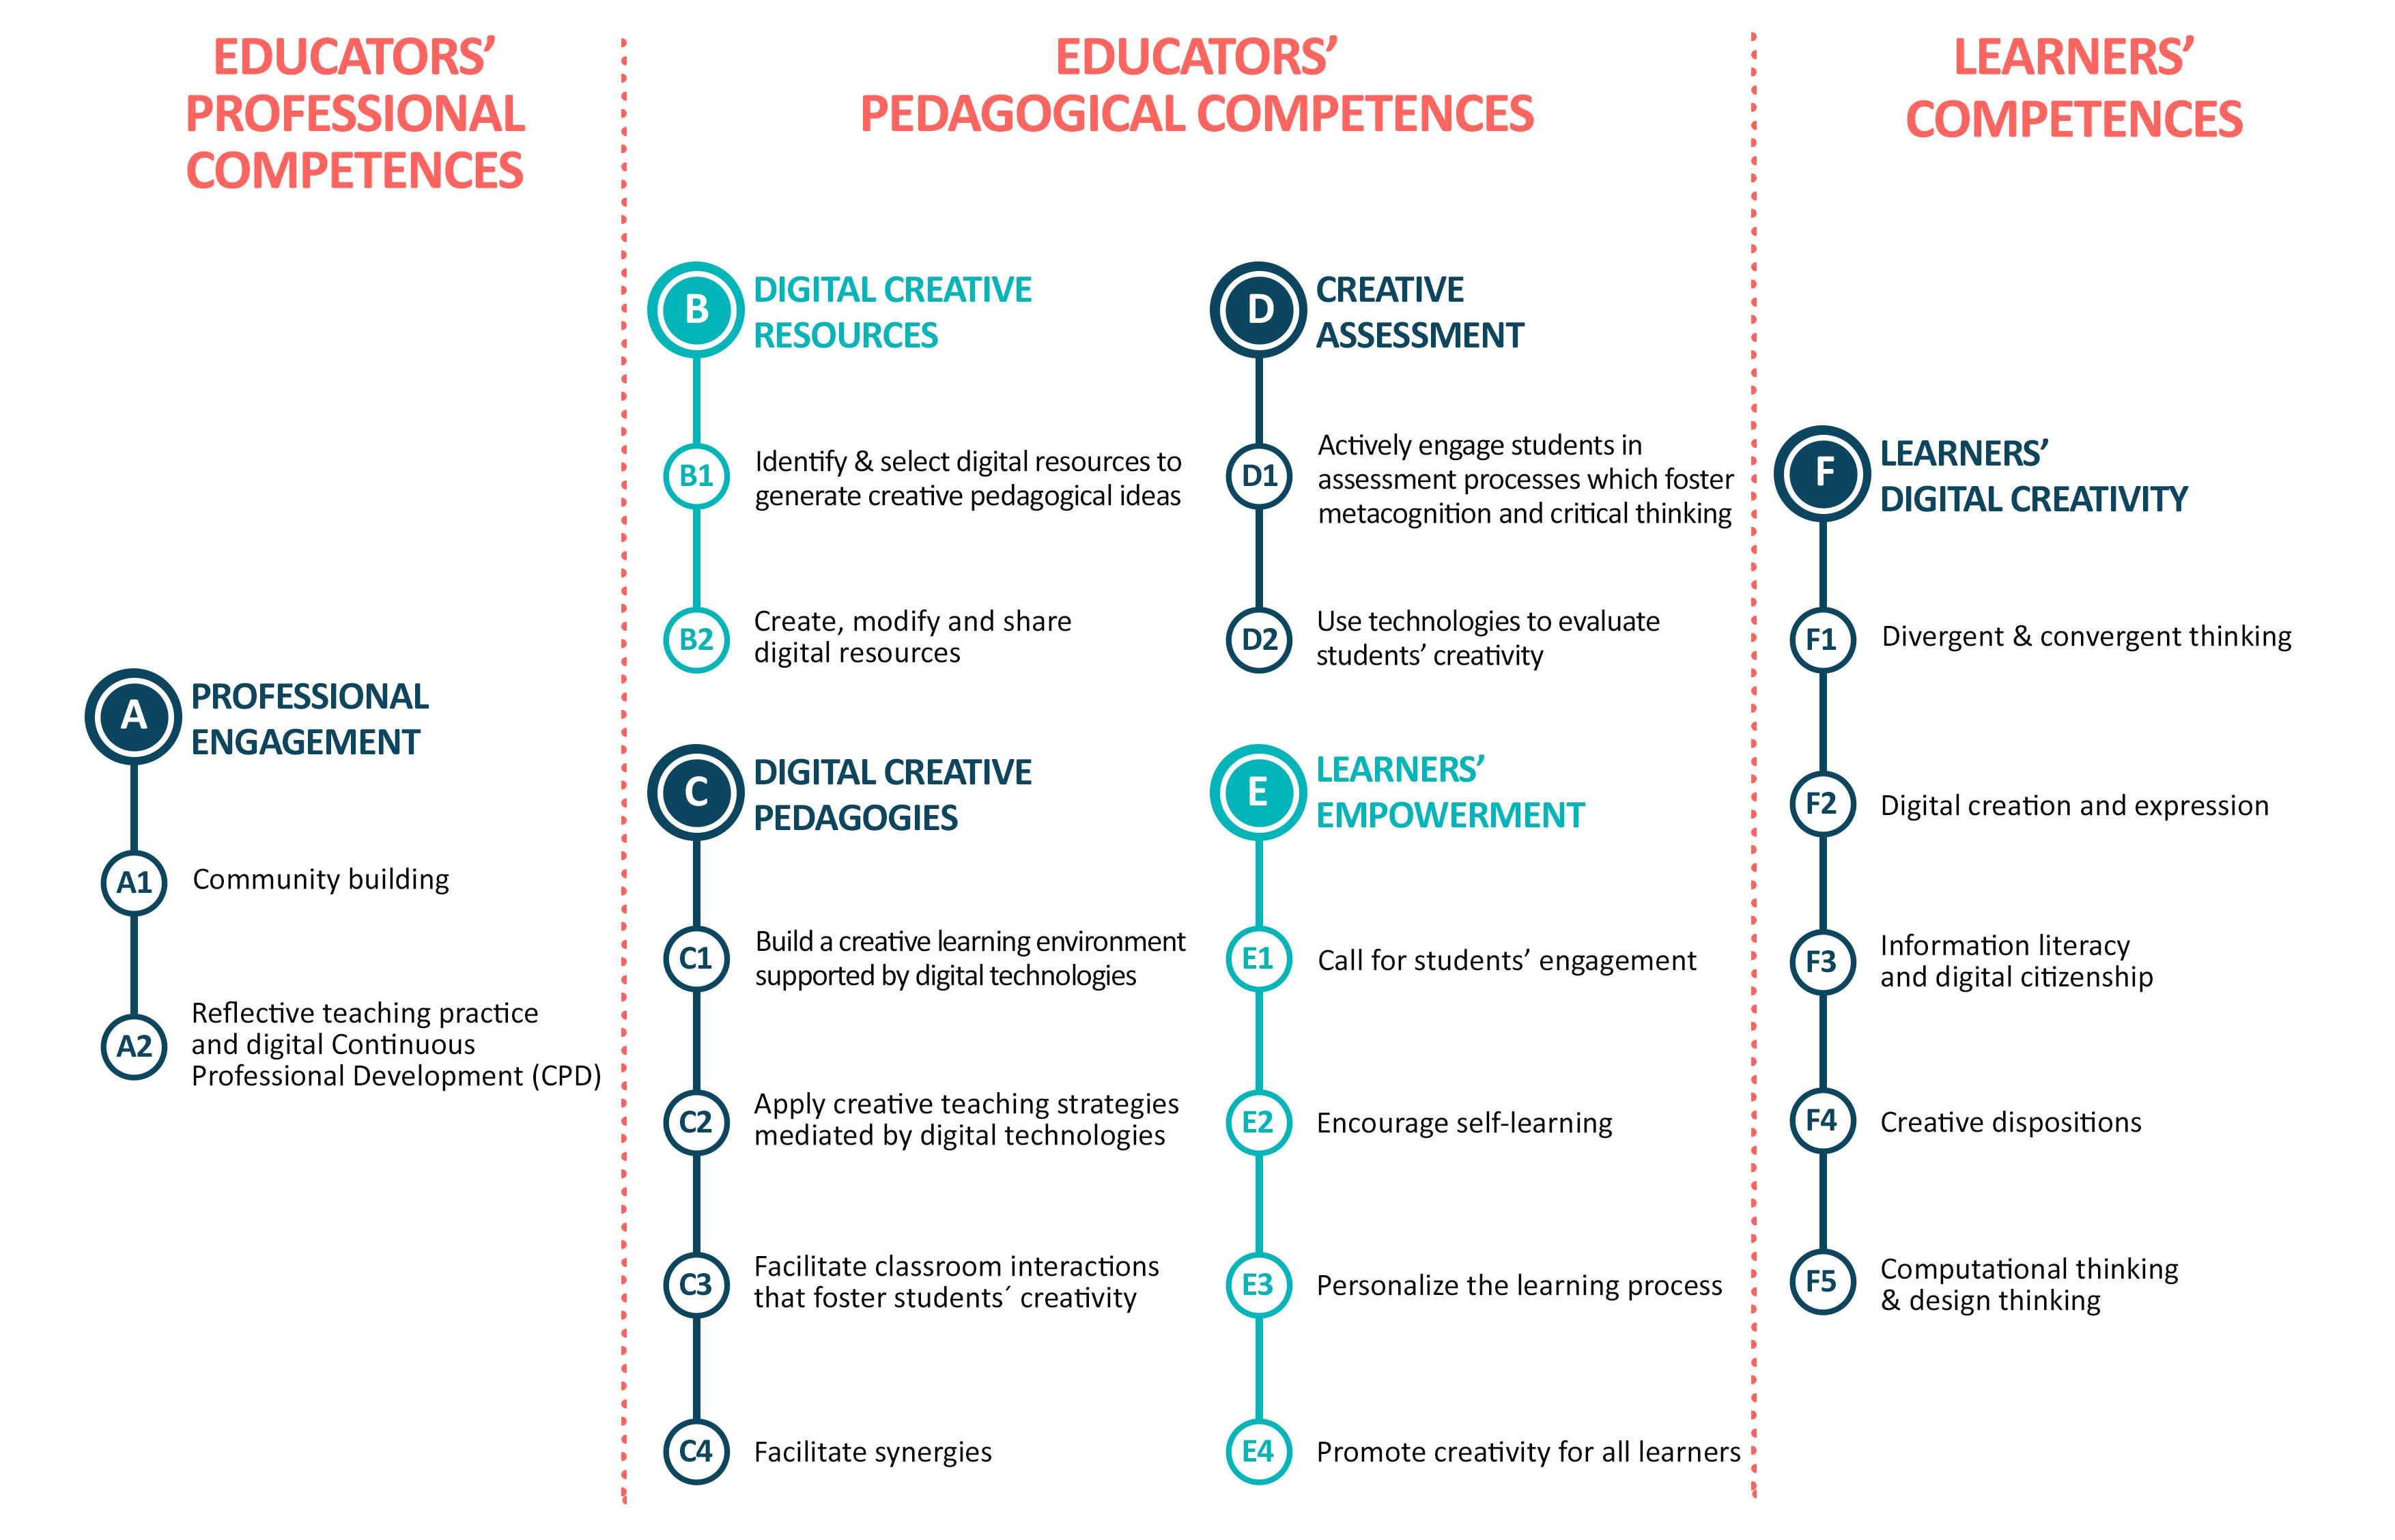 DoCENT_competence_framework